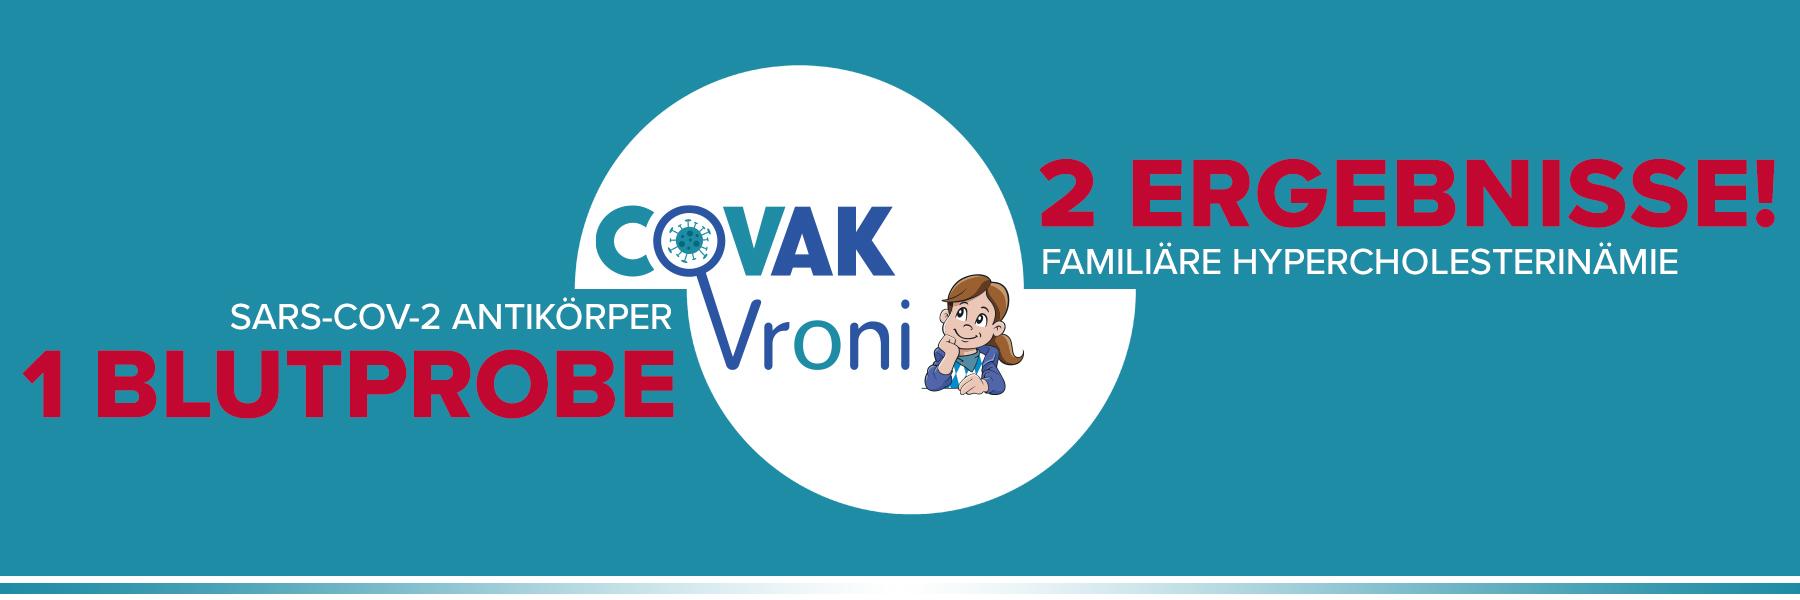 covak_antikoerper_testung_1